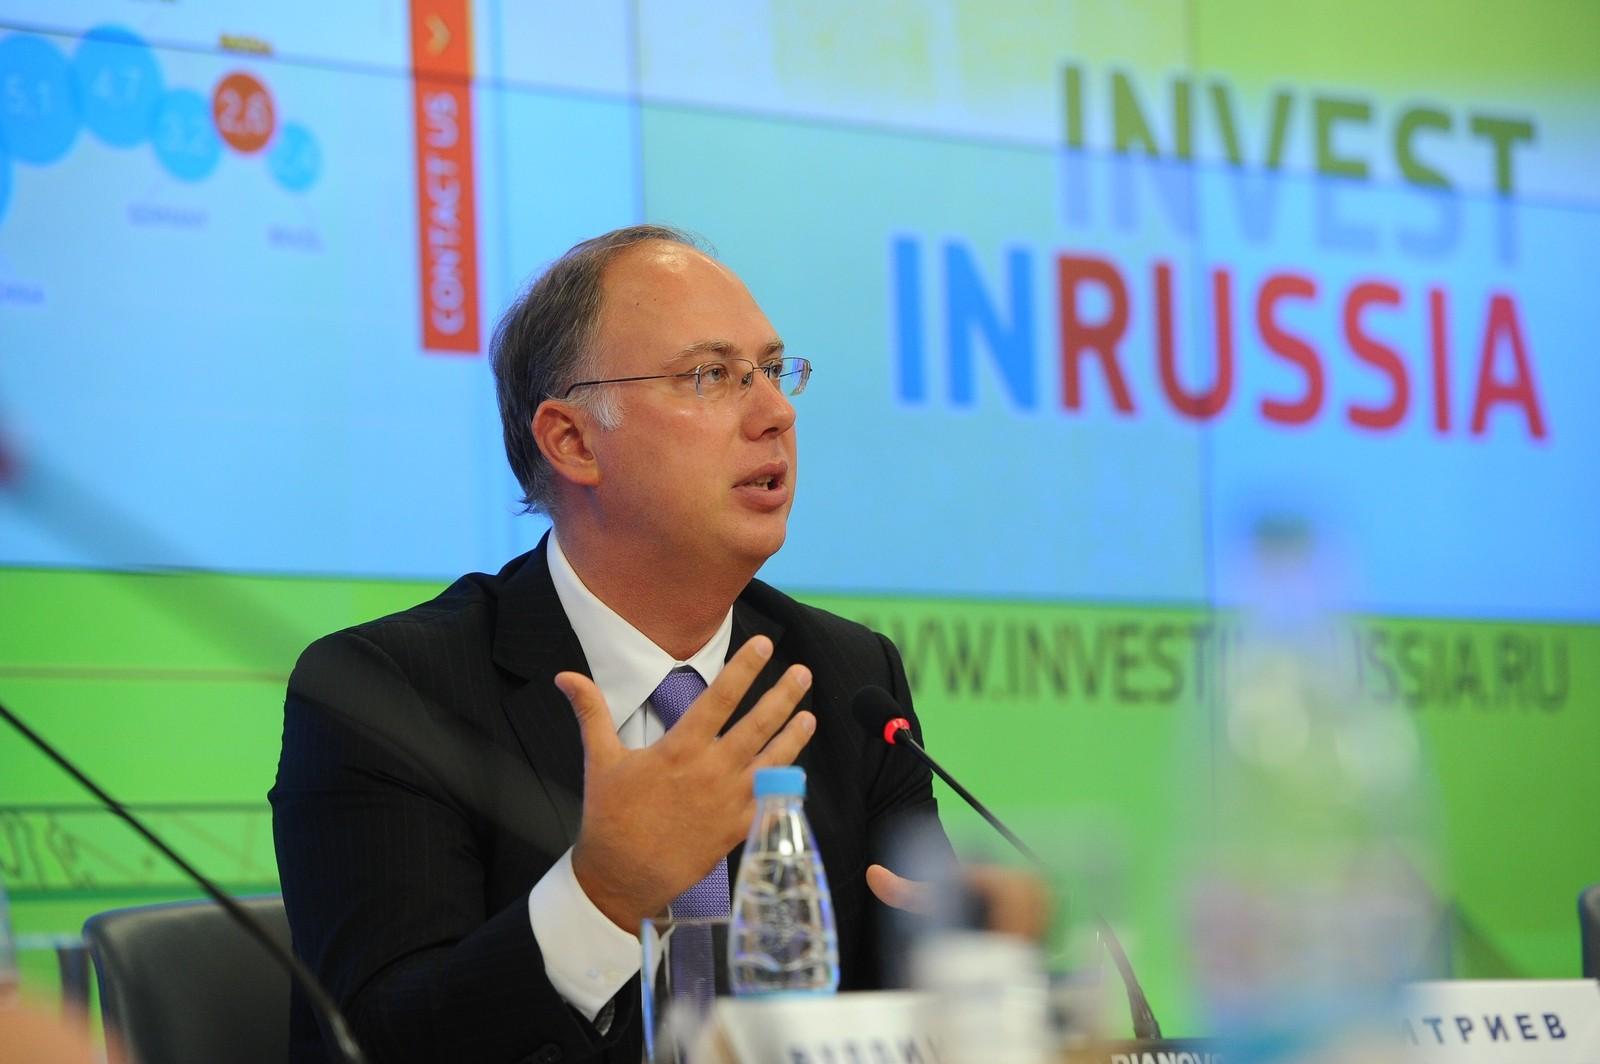 Приватизация «Башнефти» может пройти ксередине осени